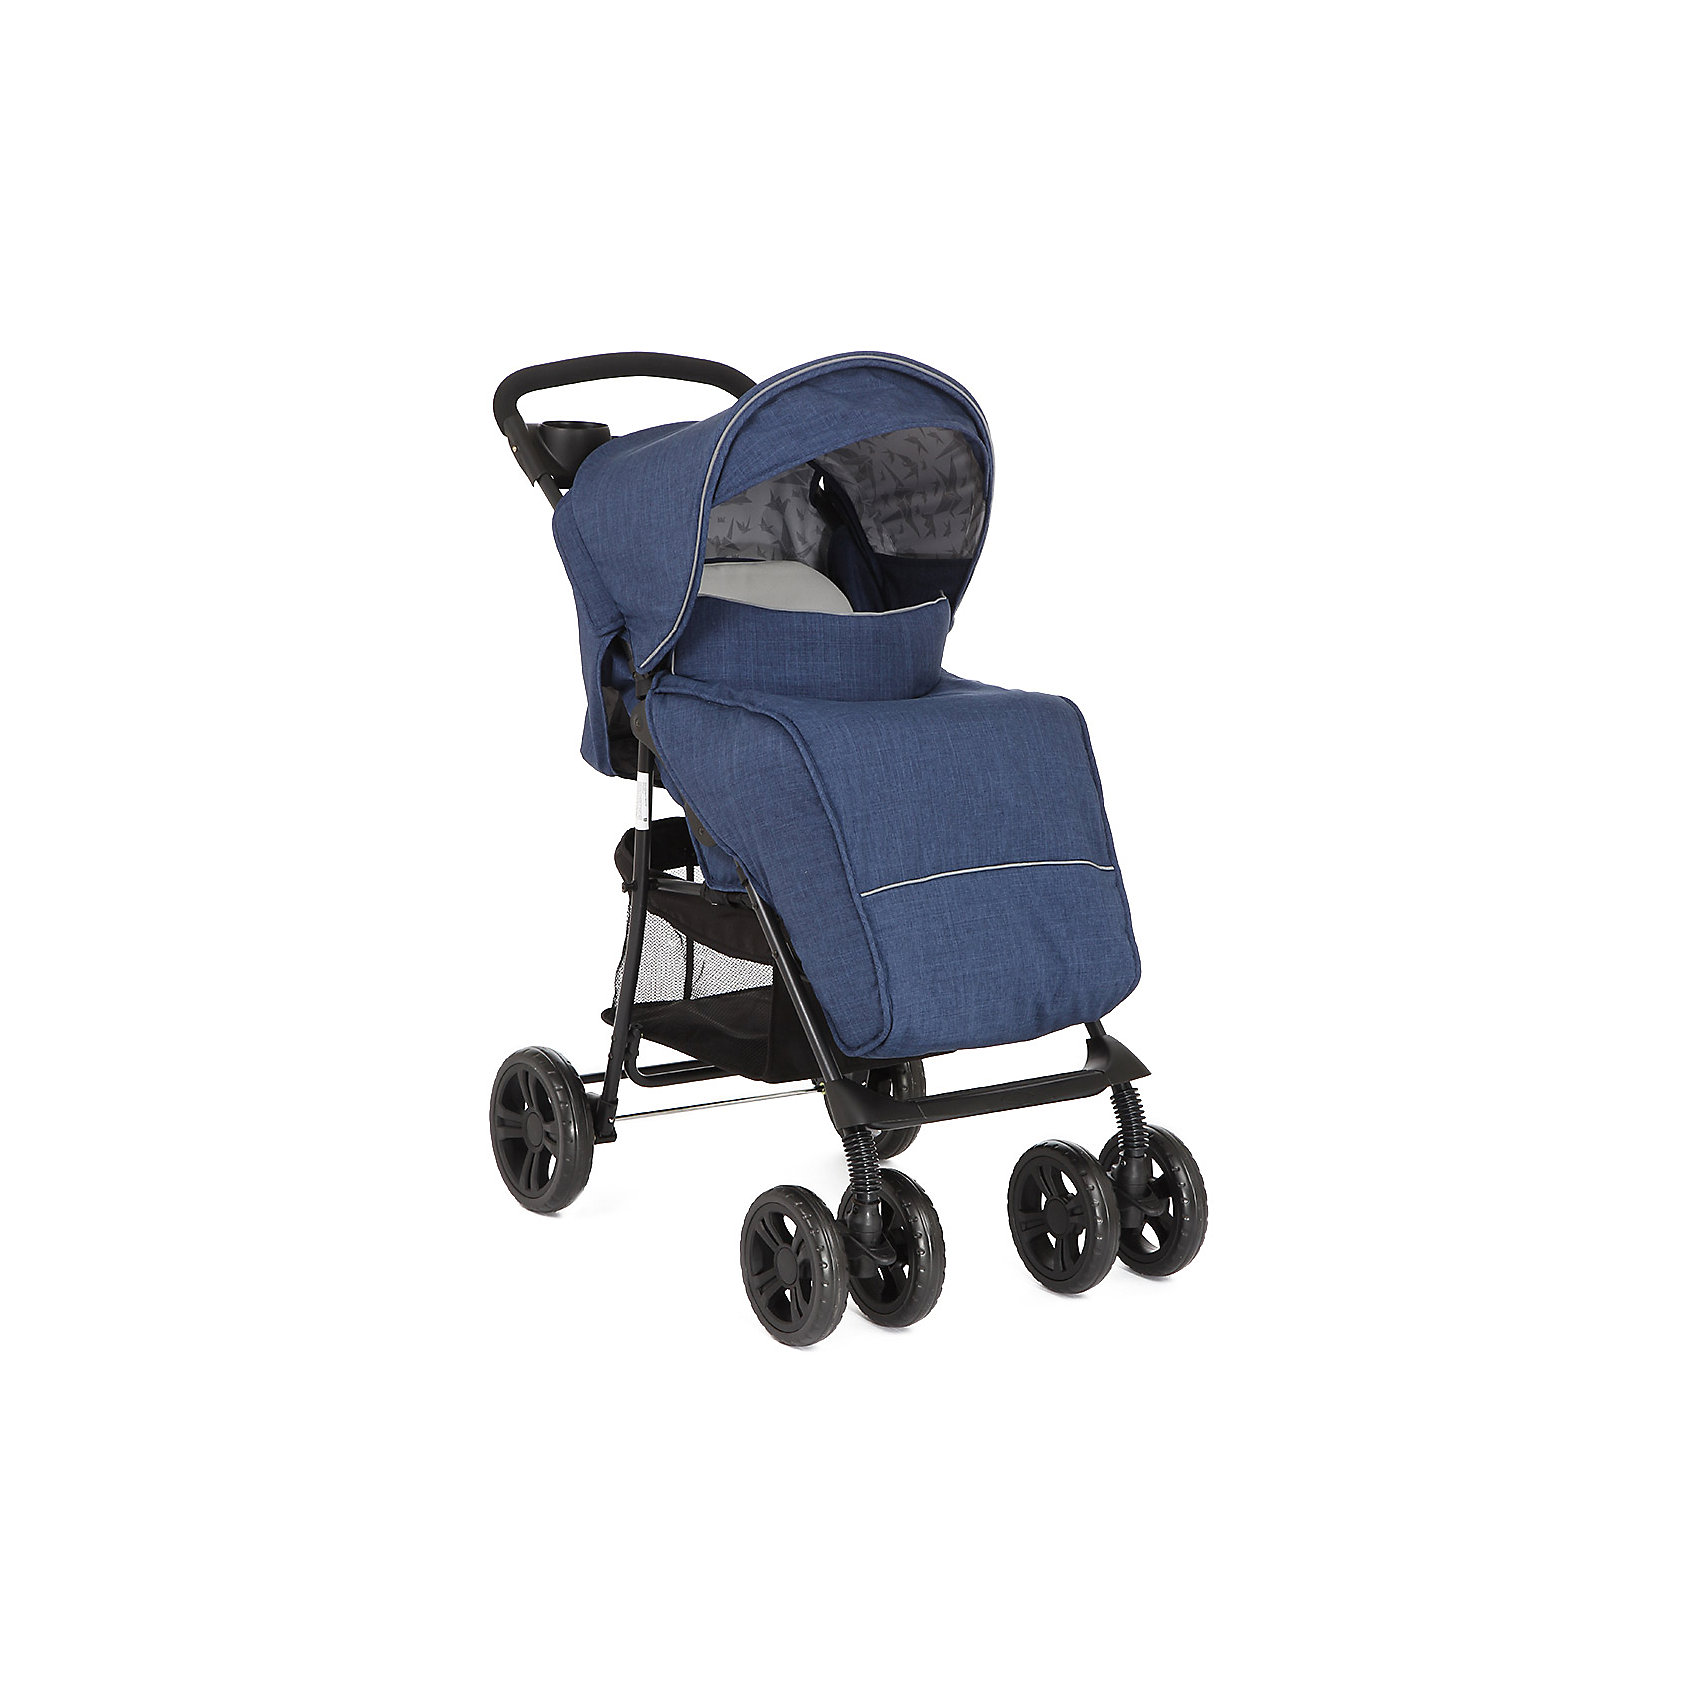 Прогулочная коляска E0970 TEXAS Mobility One, джинс